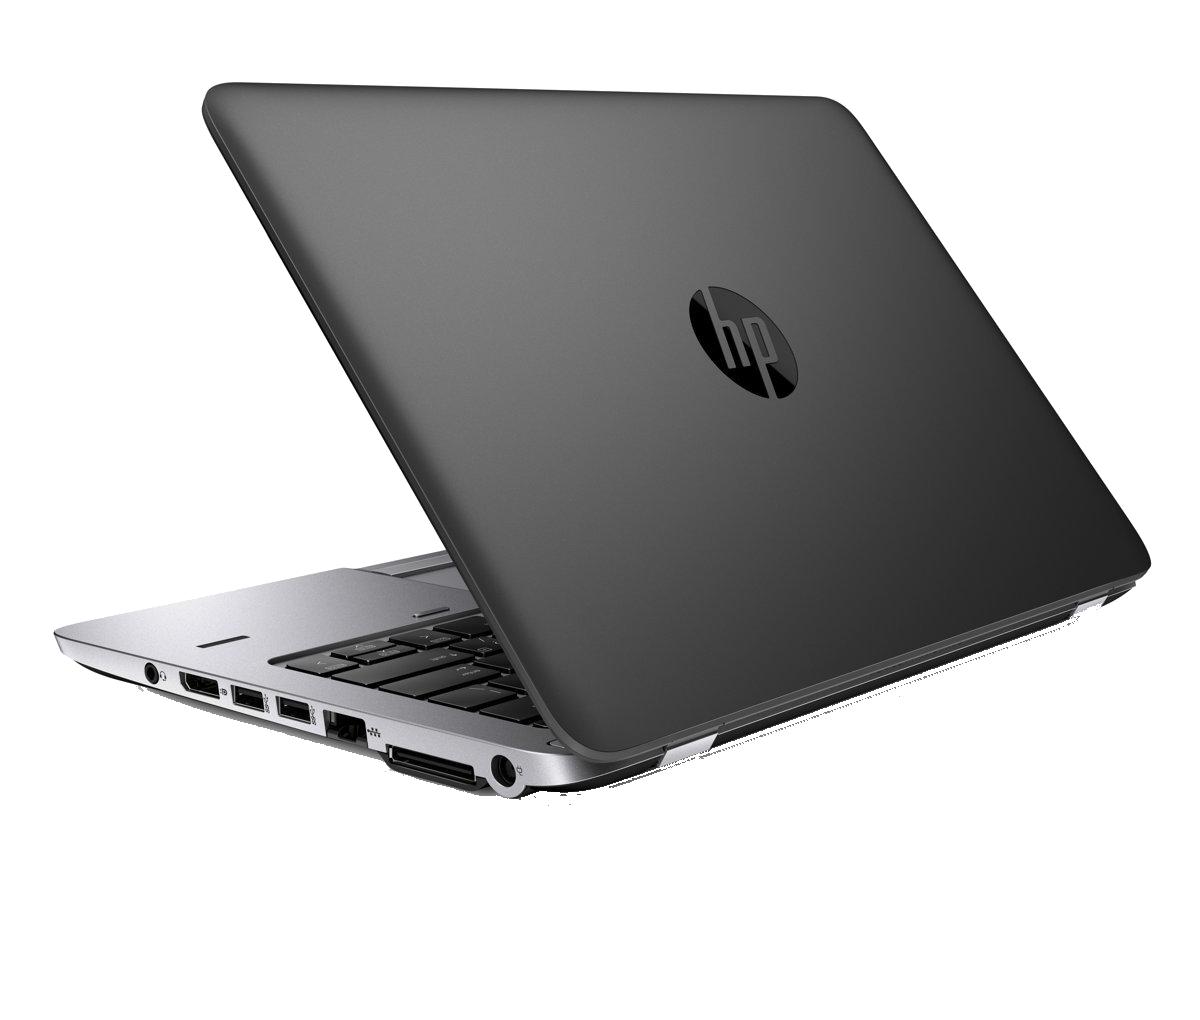 HP EliteBook 820 G2 portátiles seminuevos en sant Celoni